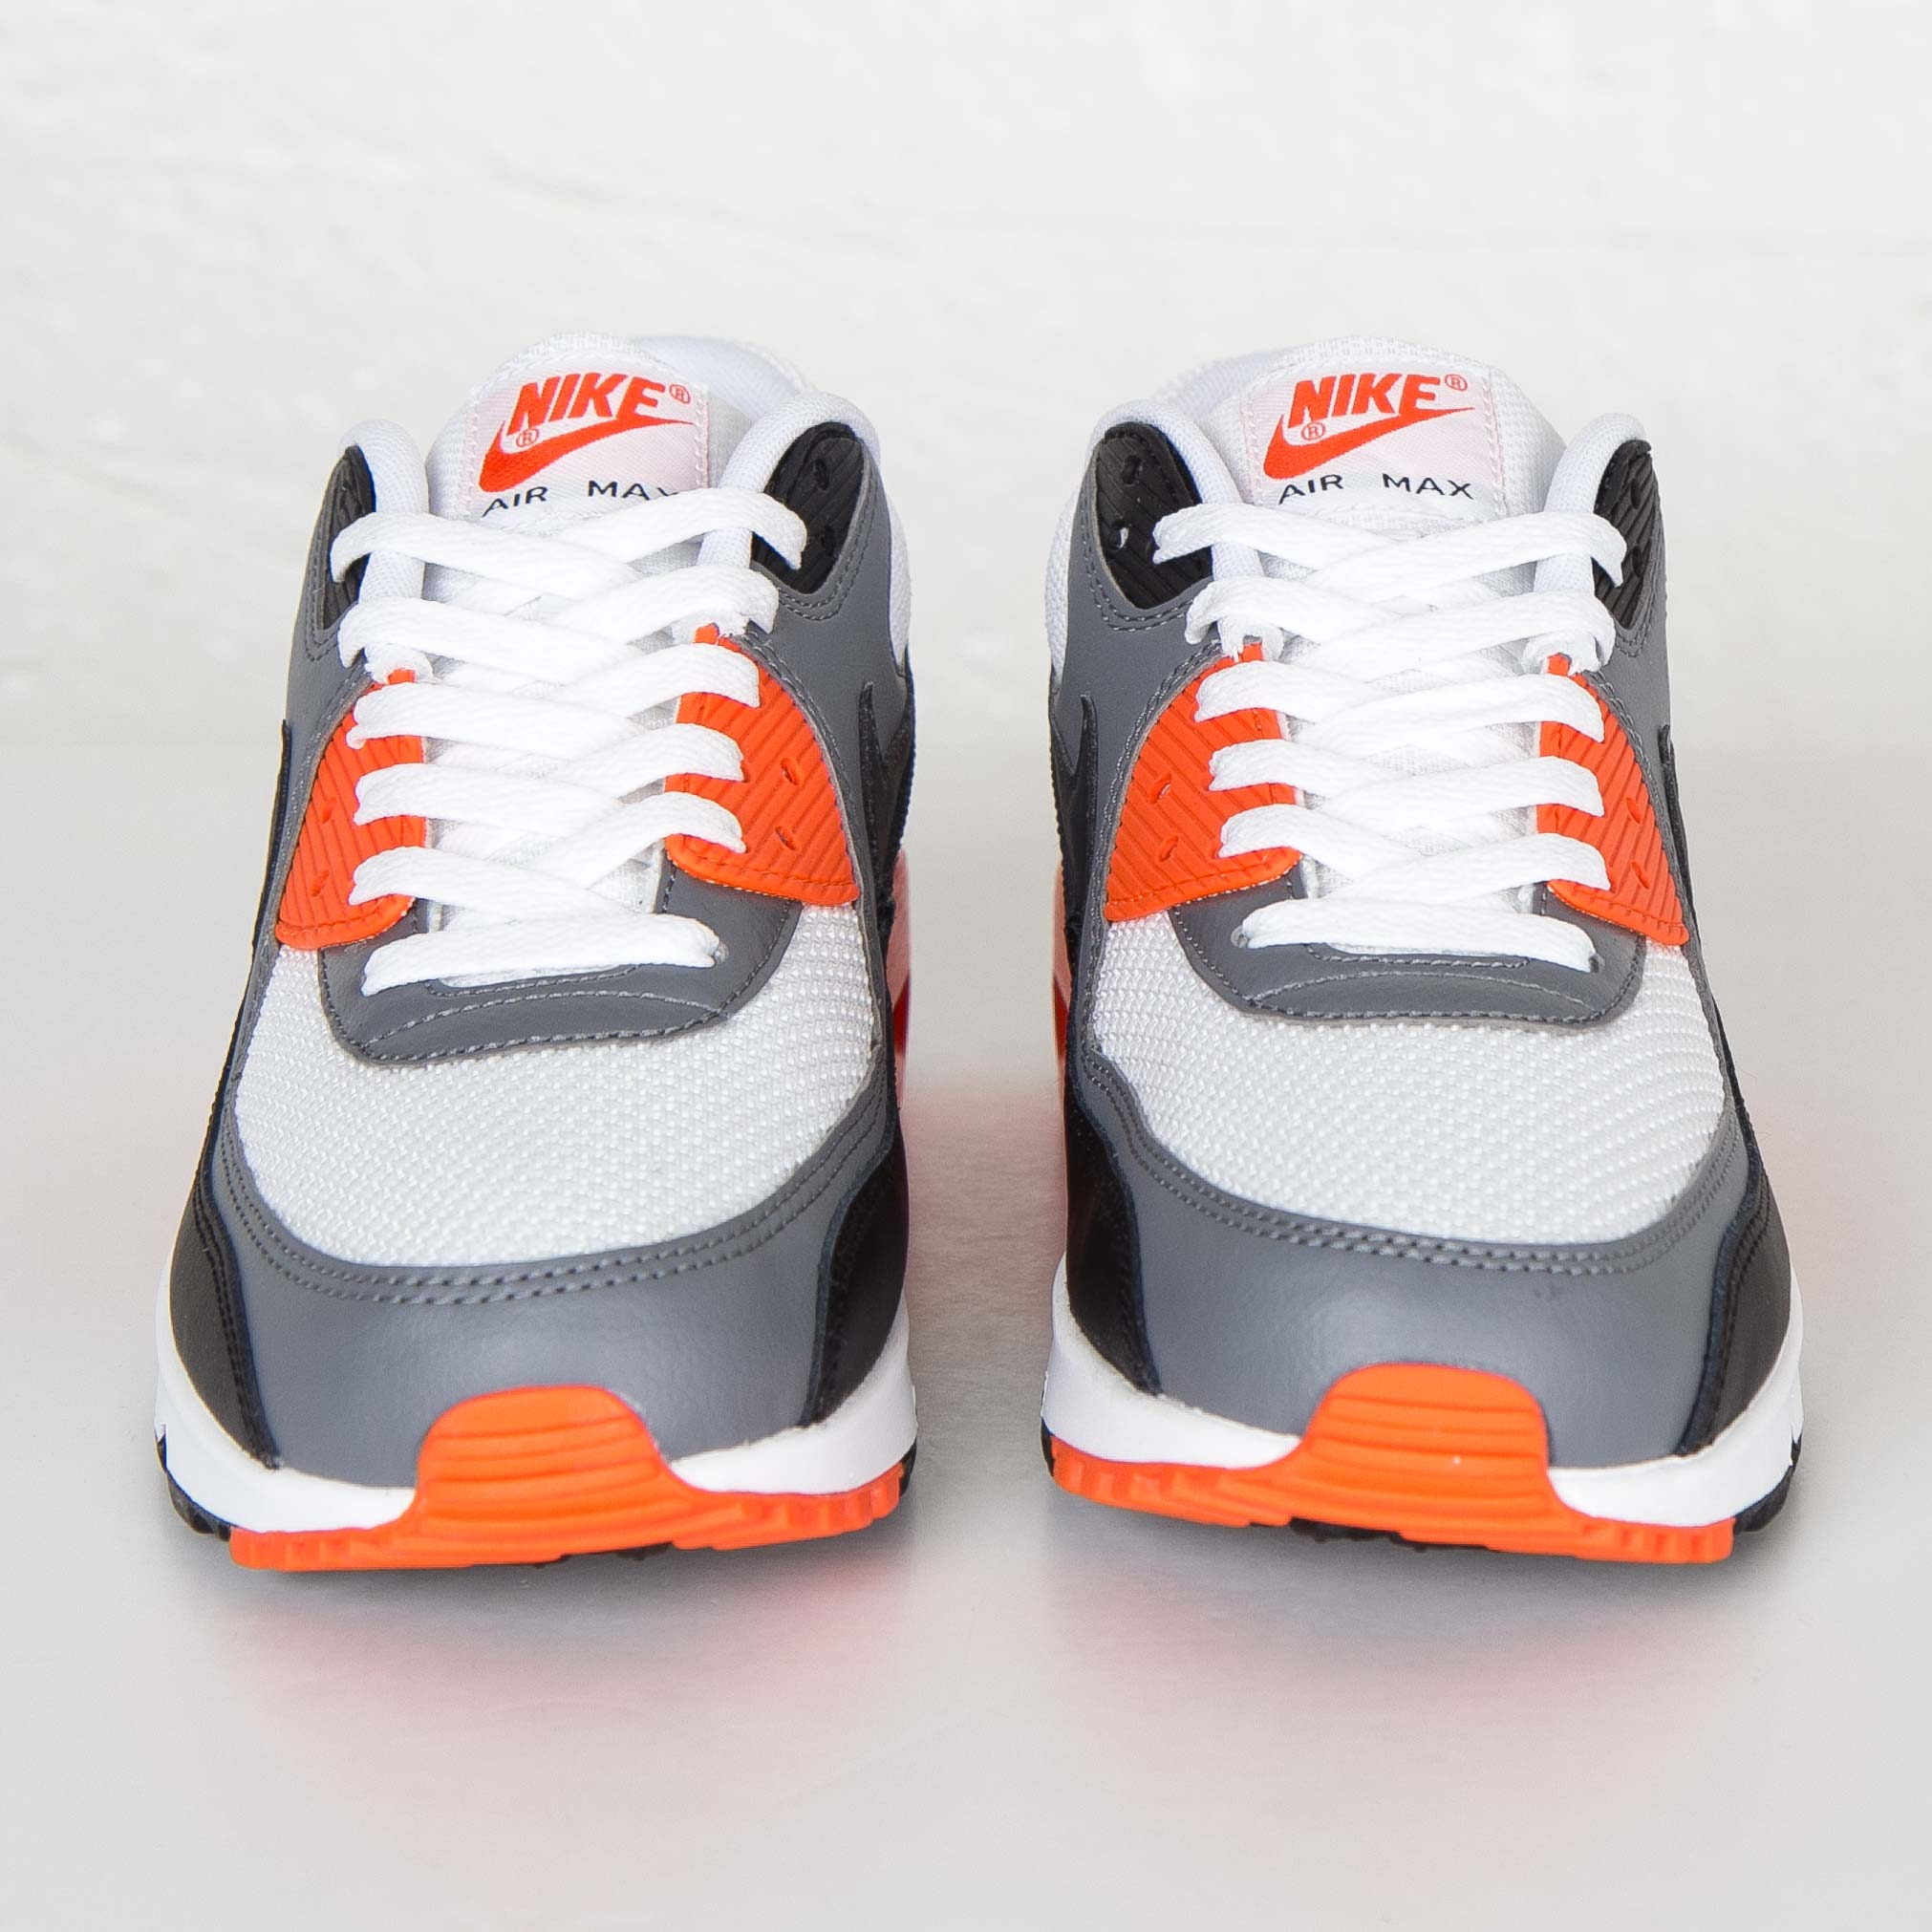 new style 879ce 4b087 Nike Air Max 90 Essential - 537384-128 - Sneakersnstuff   sneakers    streetwear online since 1999